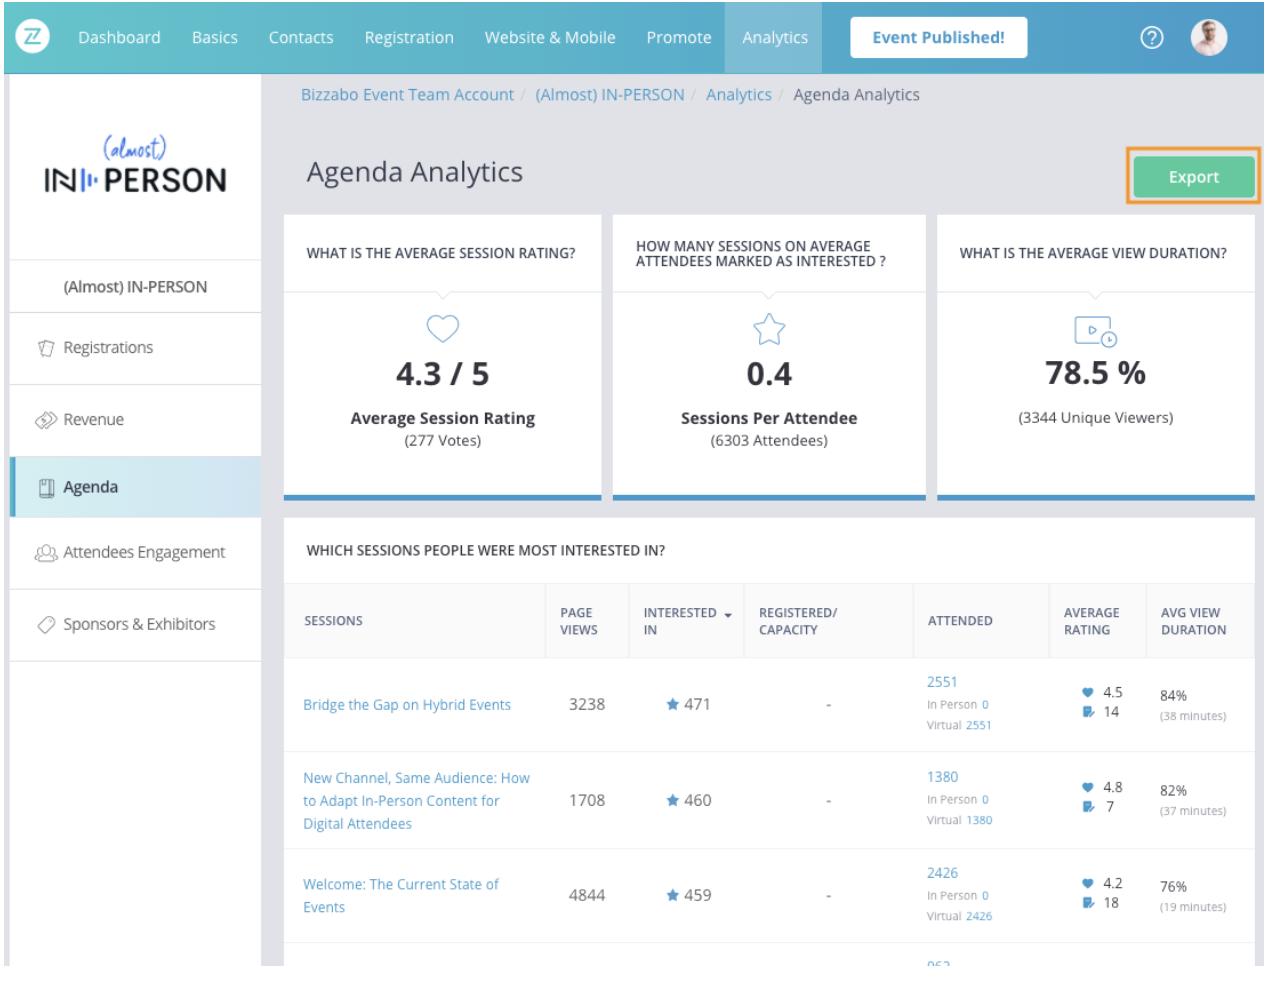 Agenda Analytics - KPIs to Measure Event Success